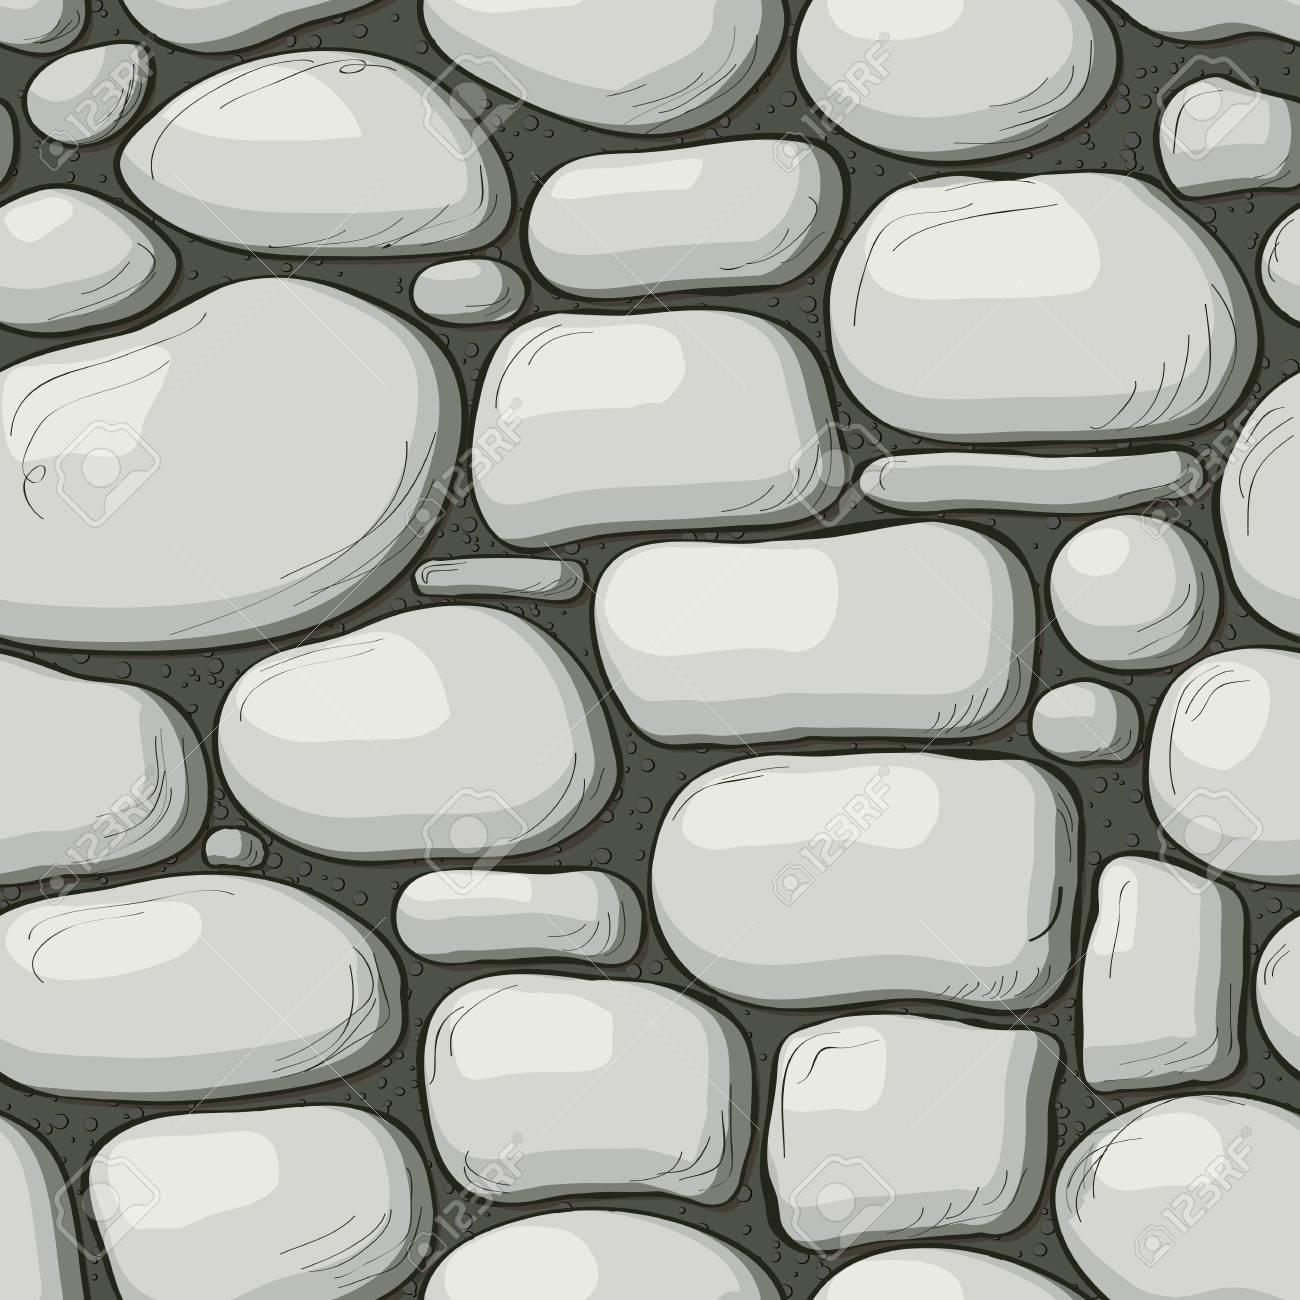 Texture De Mur En Pierre De Style Dessin Animé Fond De Page Web